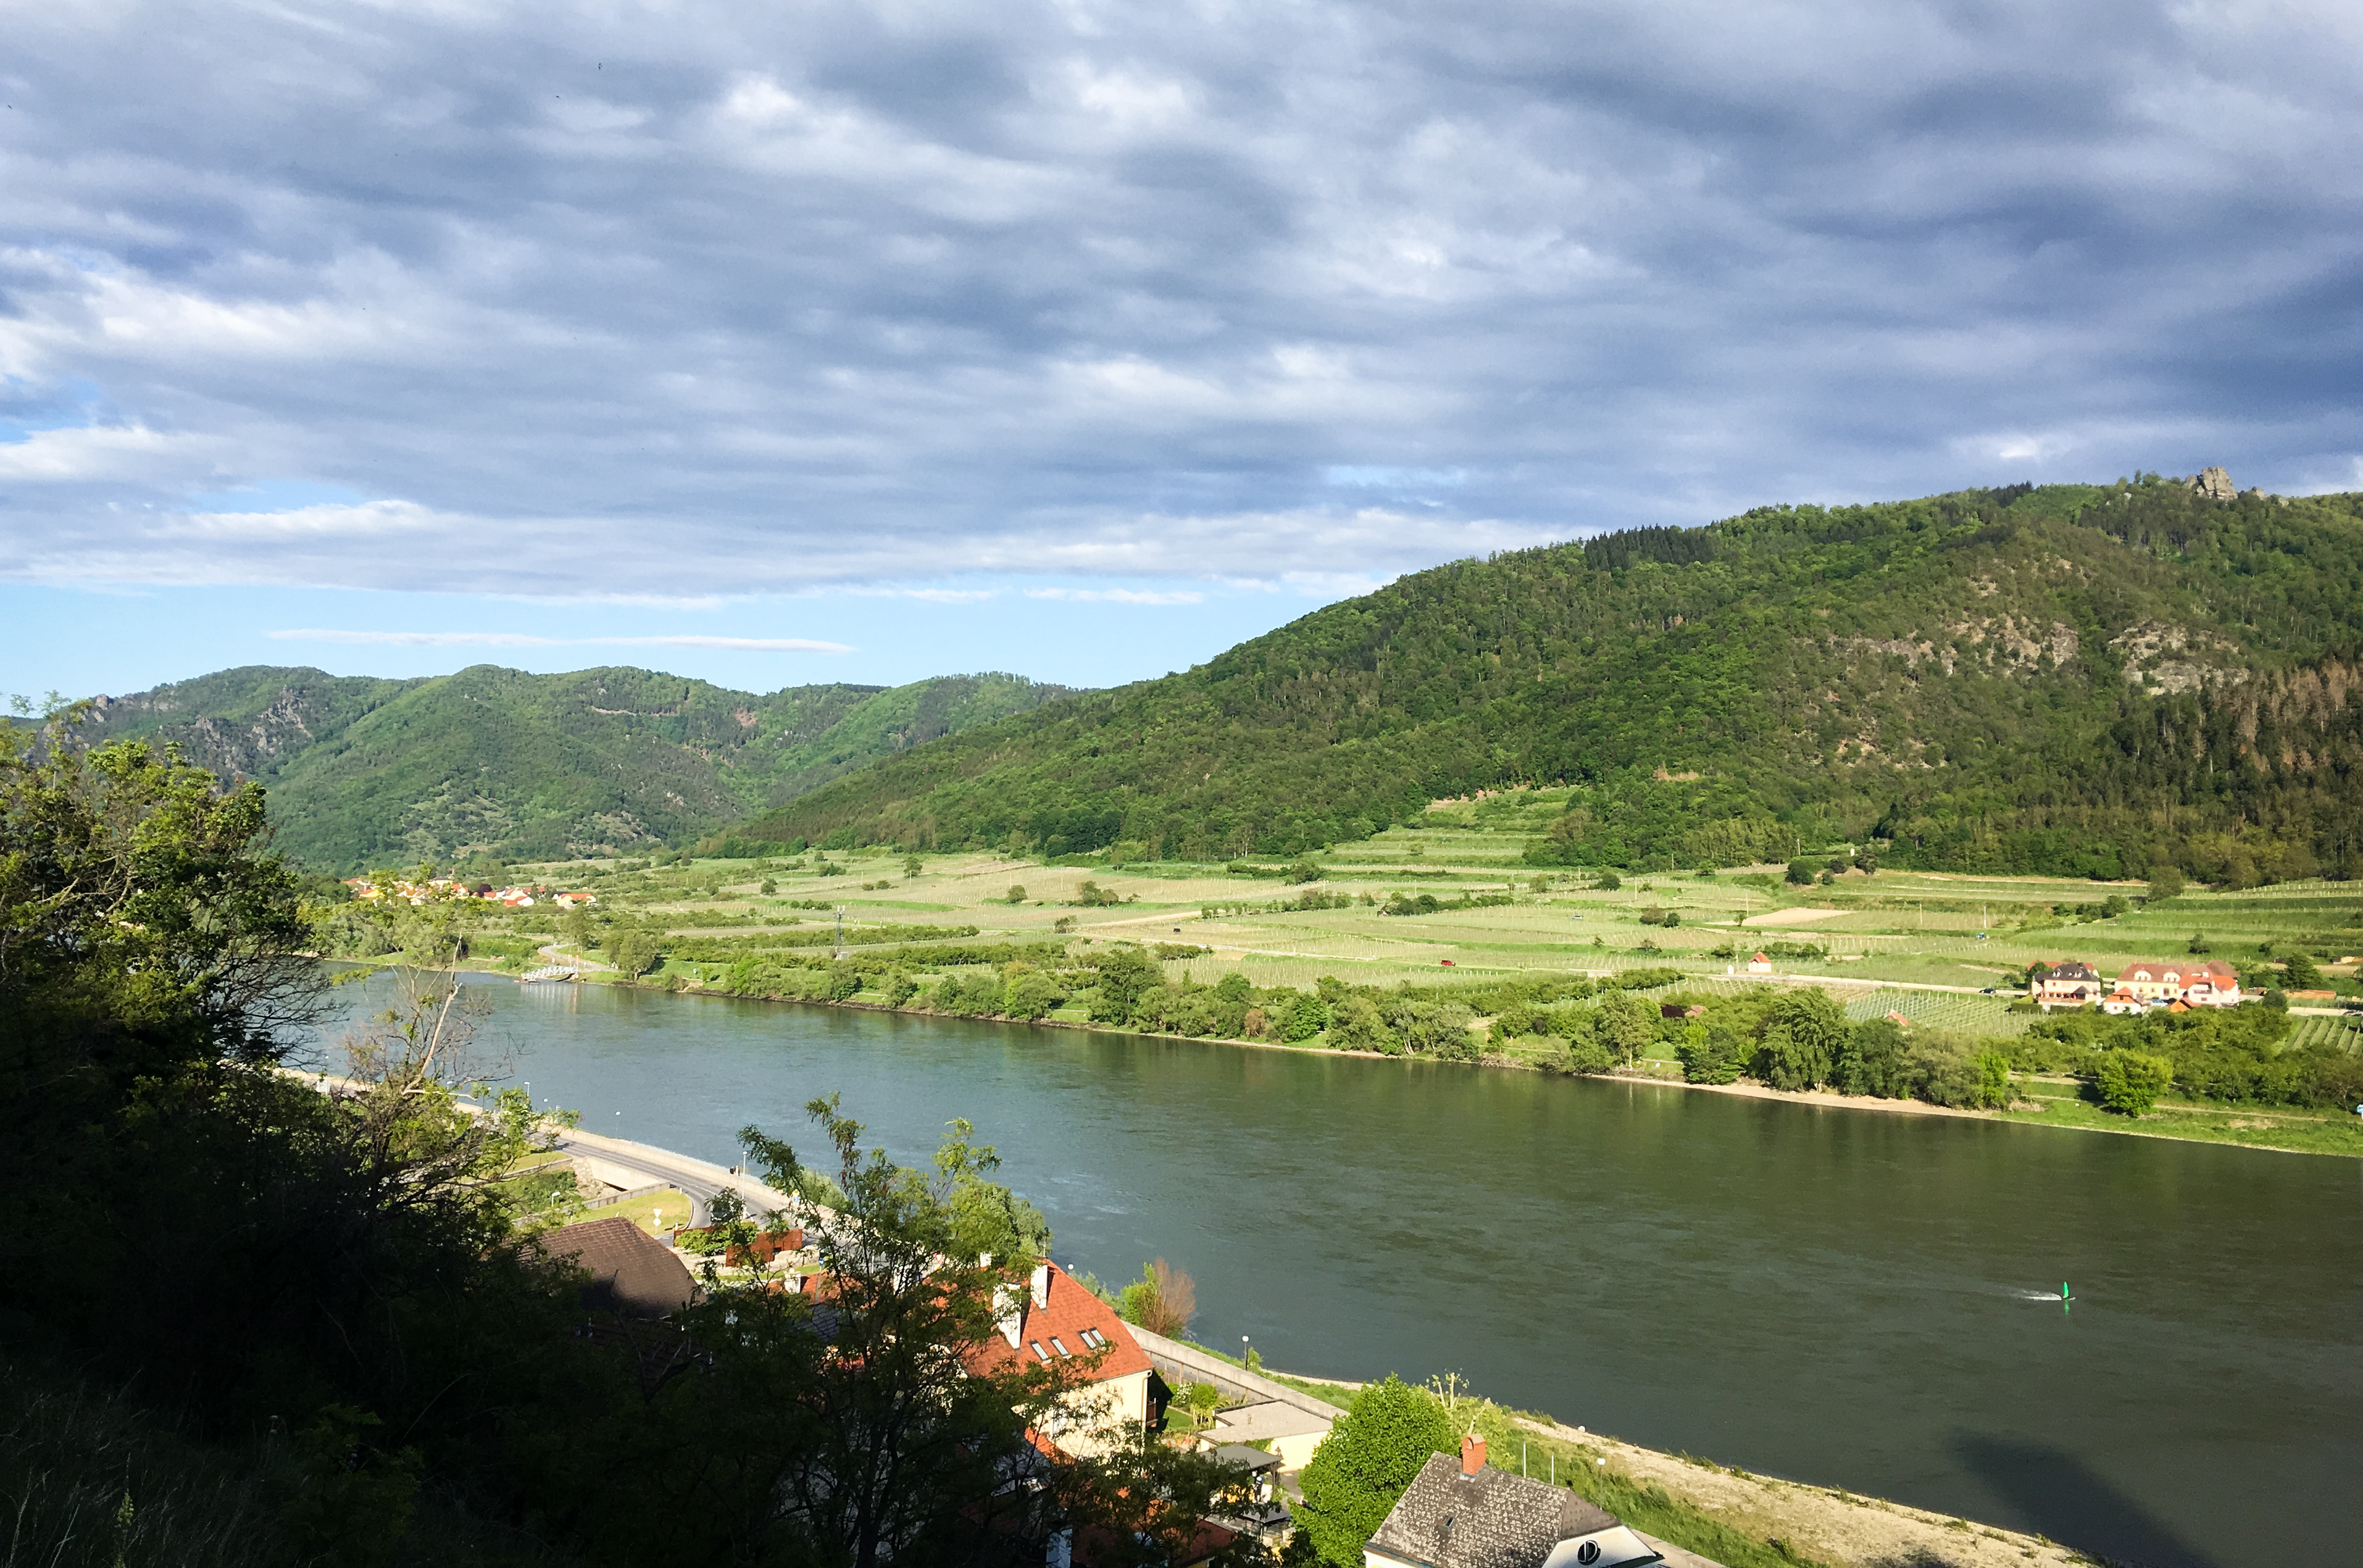 Donau nahe Schwallenbach